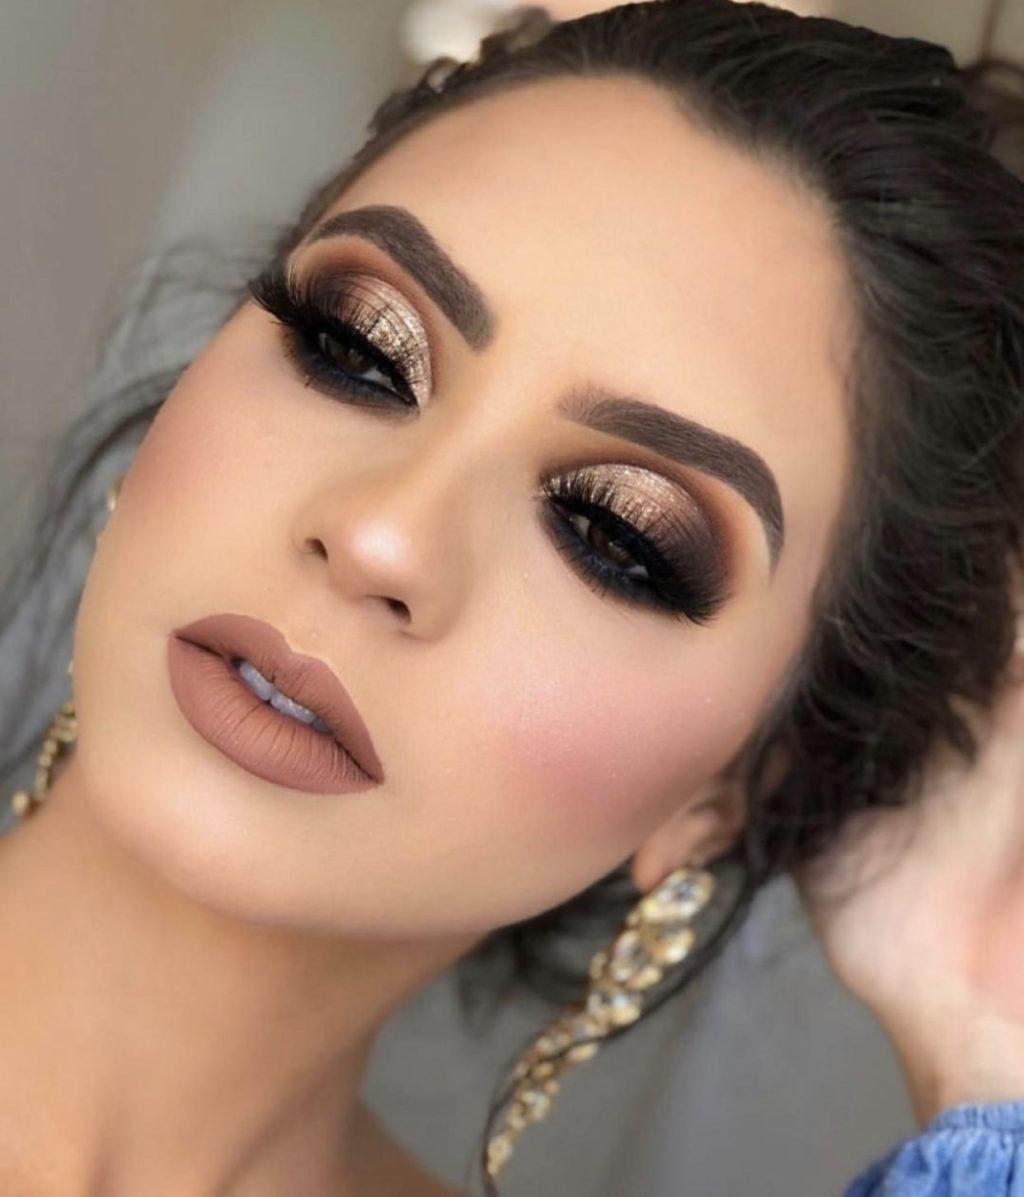 Basic-Smokey-Eye-with-glitter-1024x1197 60+ Hottest Smokey Eye Makeup Looks in 2020